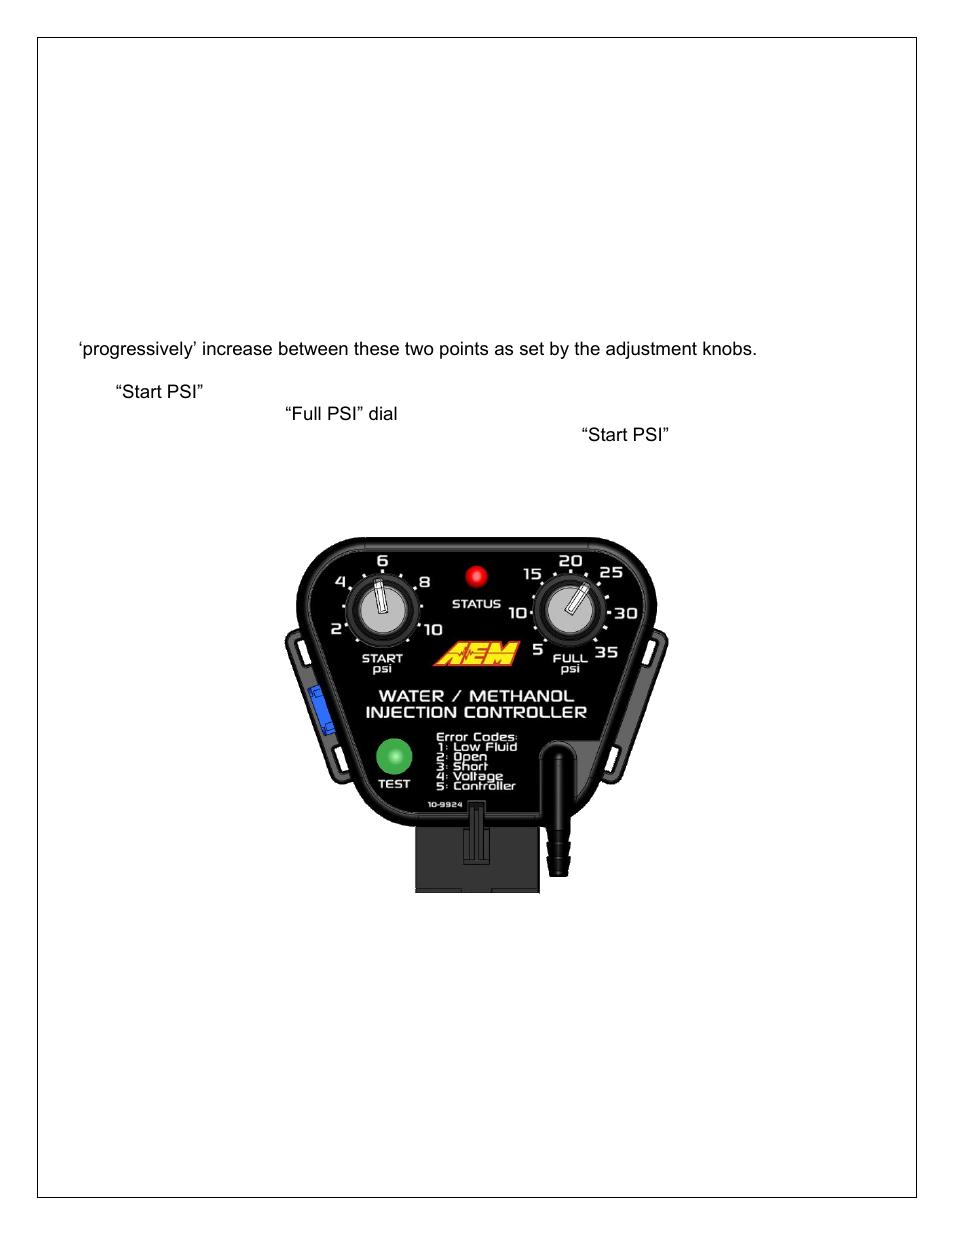 Controller Aem 30 3306 V2 Water Methanol Hd Kit User Wiring Harness Manual Page 2 6